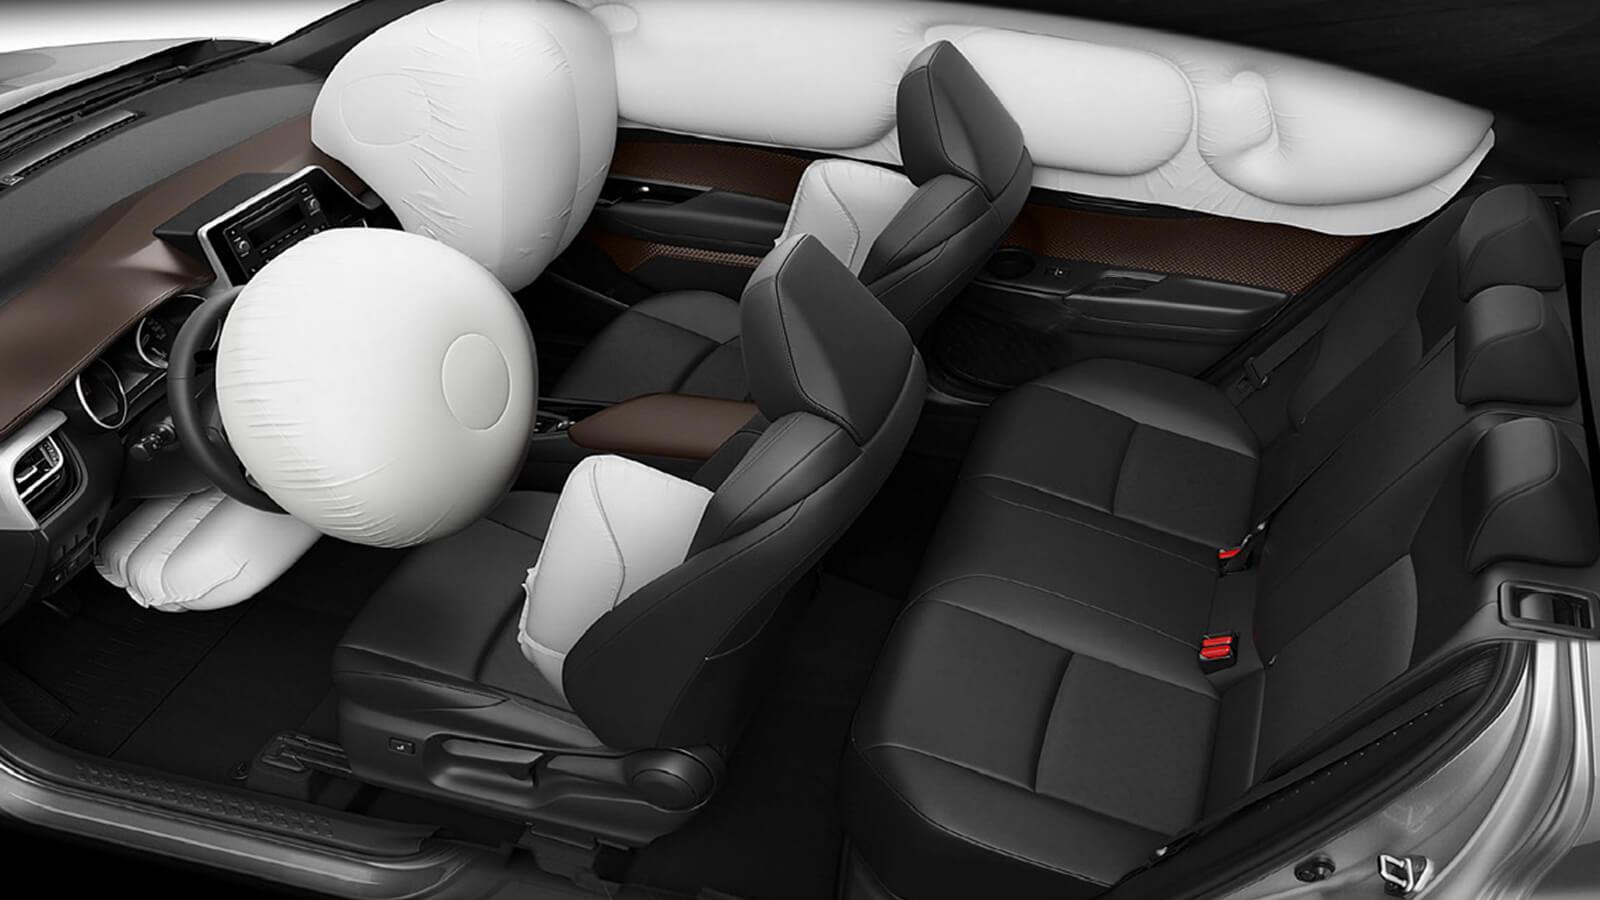 Toyota CHR especificaciones técnicas de las 7 bolsas de aire SRS